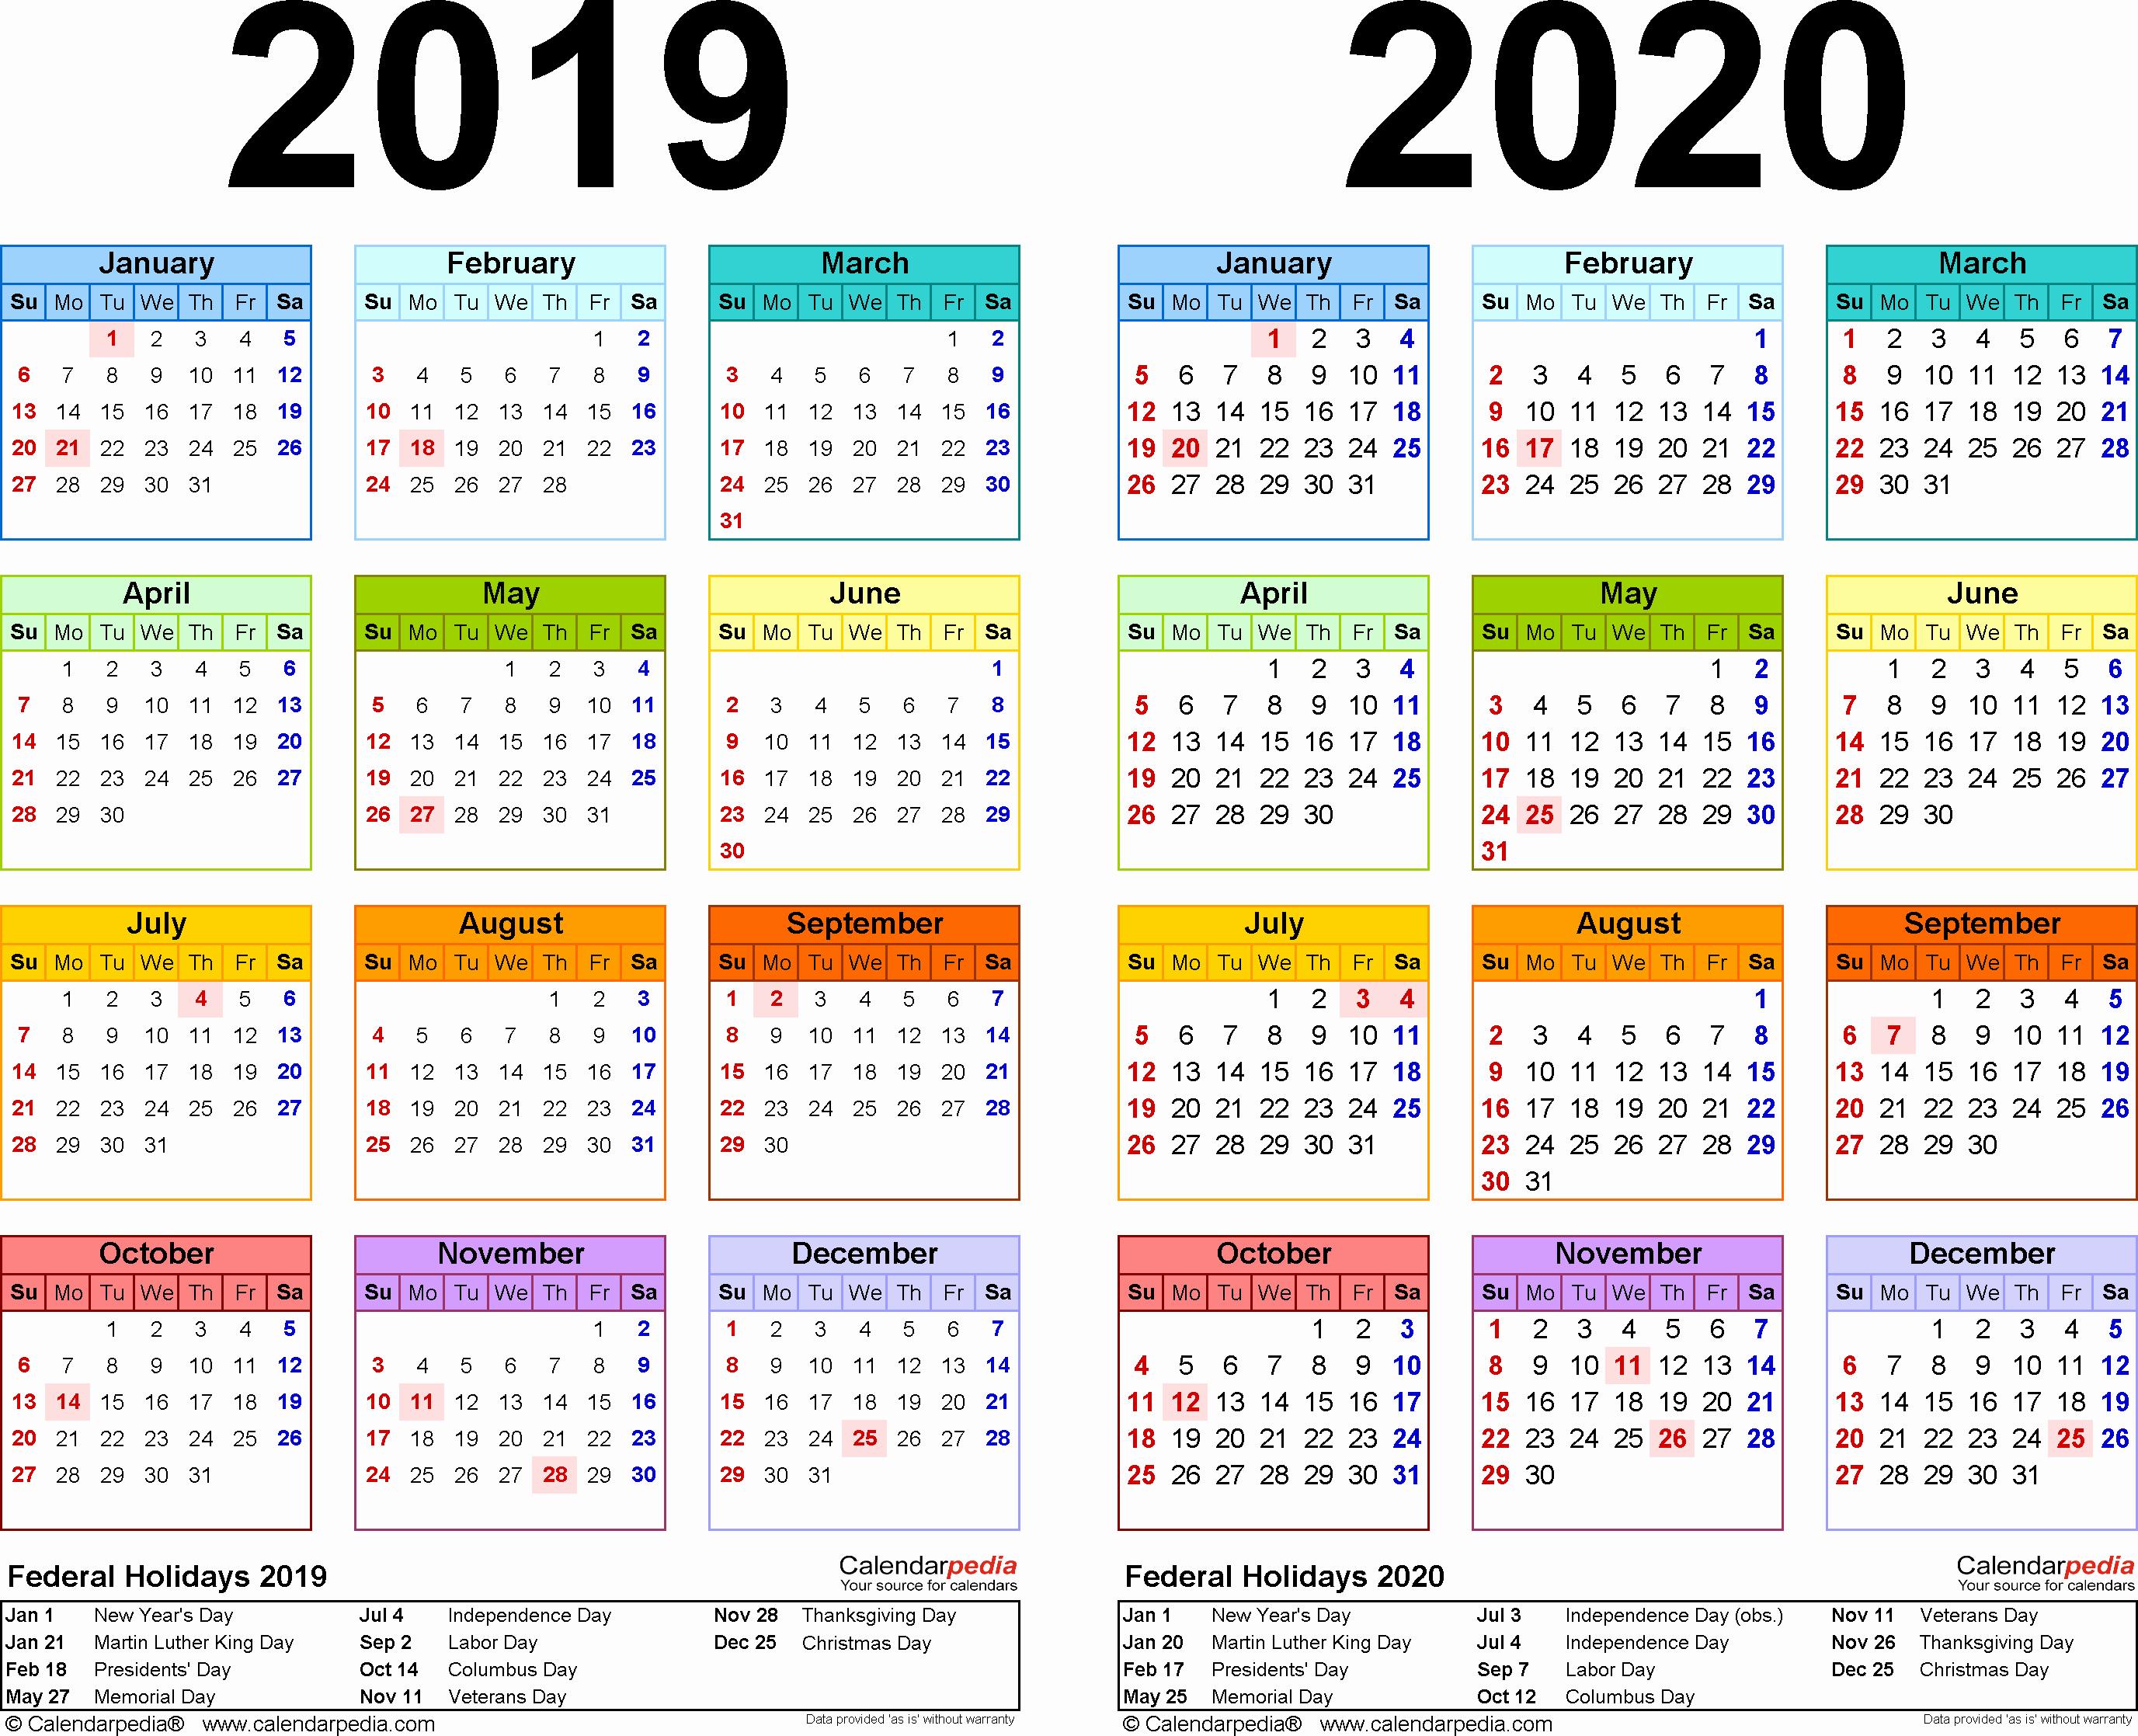 2019 and 2020 Calendar Printable Fresh 2019 2020 Calendar Free Printable Two Year Word Calendars